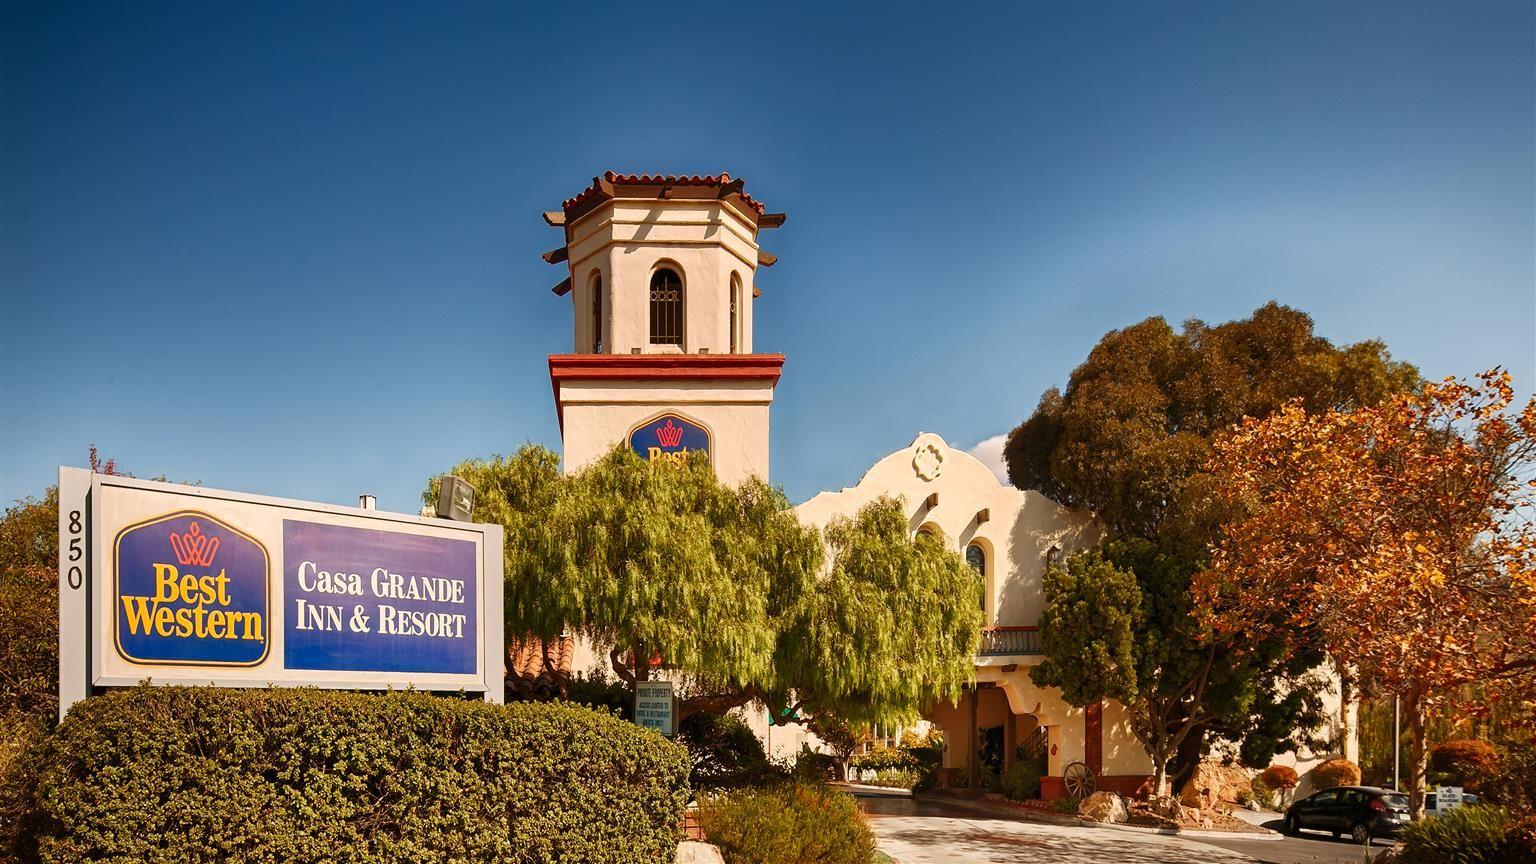 Mission Villa Style Hotel Located Next To Pismo Beach On California S Central Coast